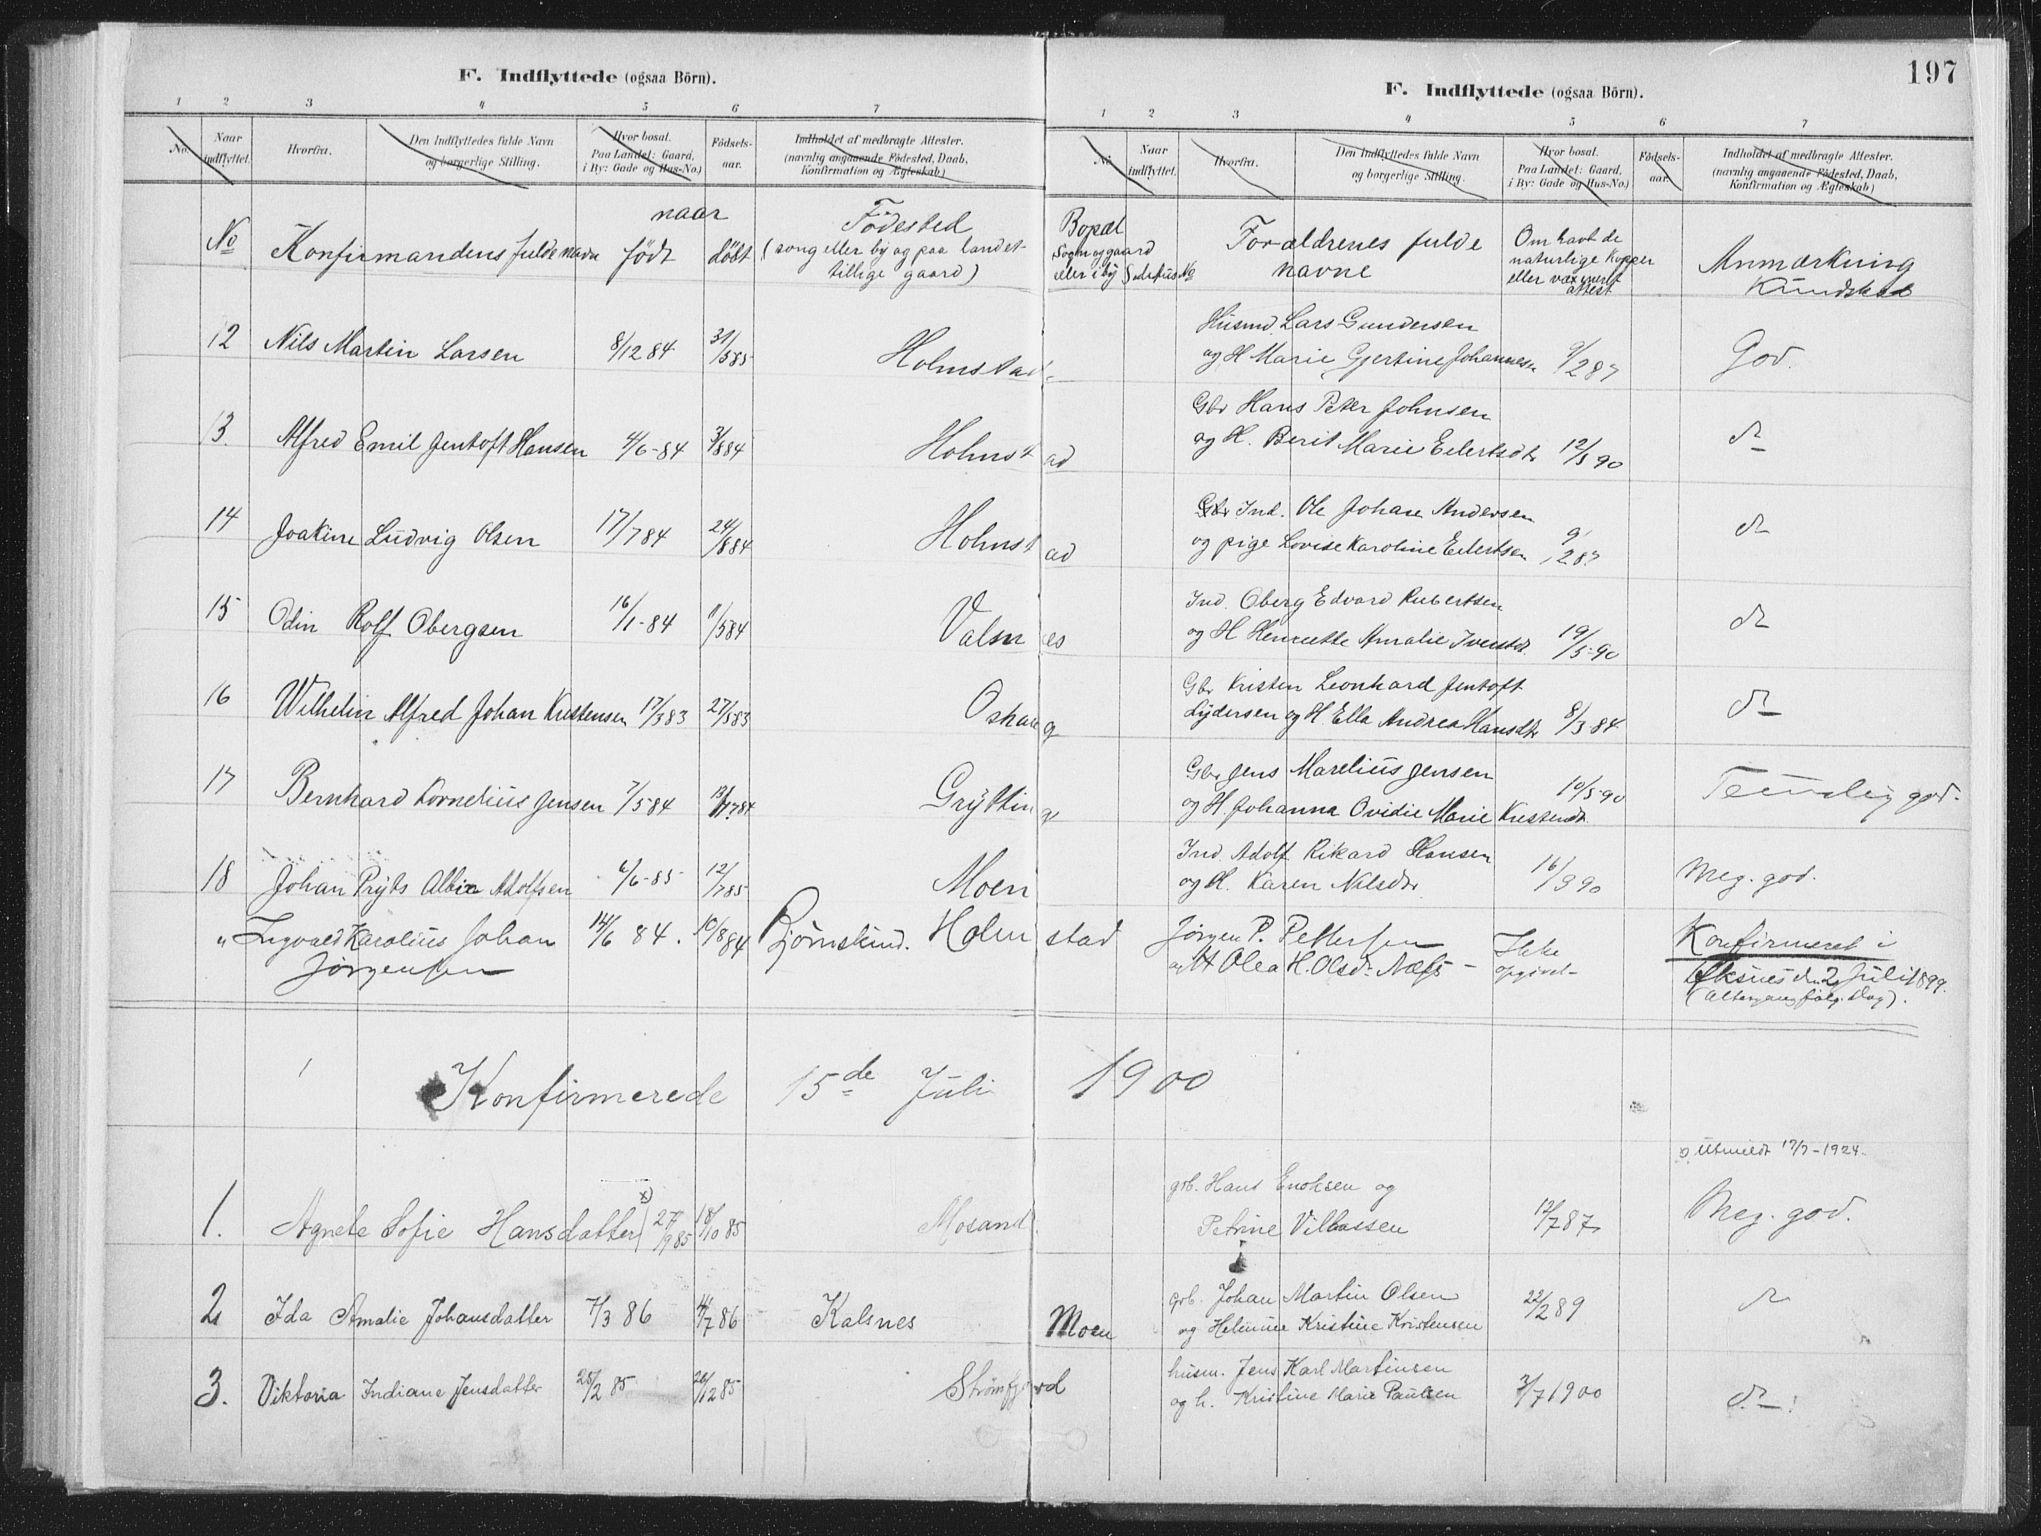 SAT, Ministerialprotokoller, klokkerbøker og fødselsregistre - Nordland, 890/L1286: Ministerialbok nr. 890A01, 1882-1902, s. 197